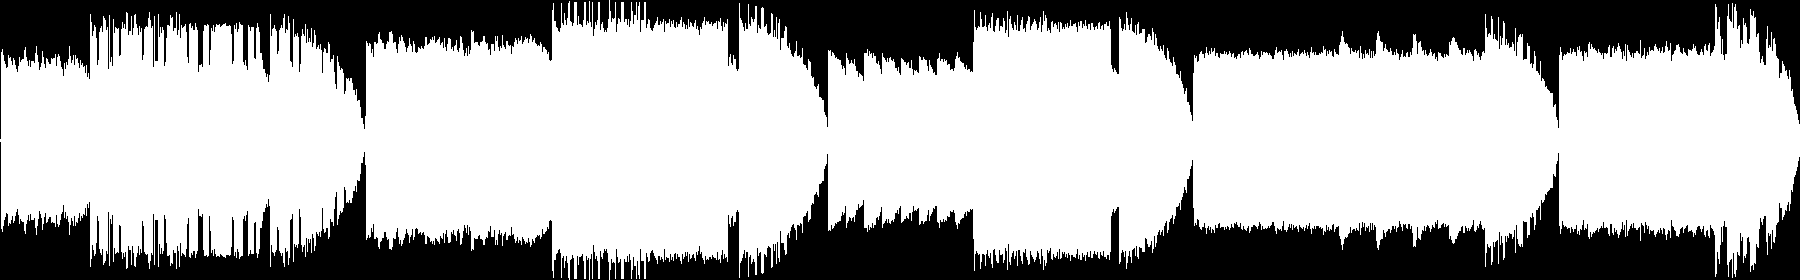 Element Cthulhu audio waveform